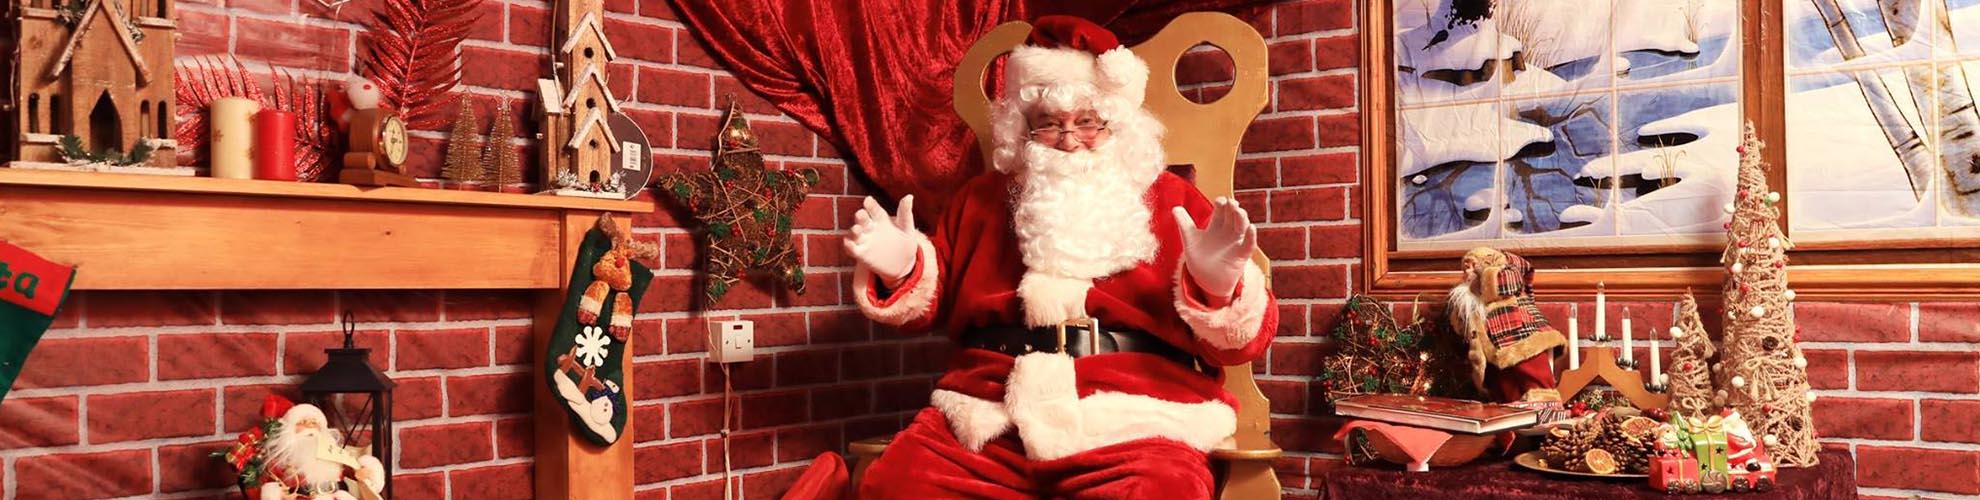 Enchanted Christmas Kingdom | Hatton Adventure World